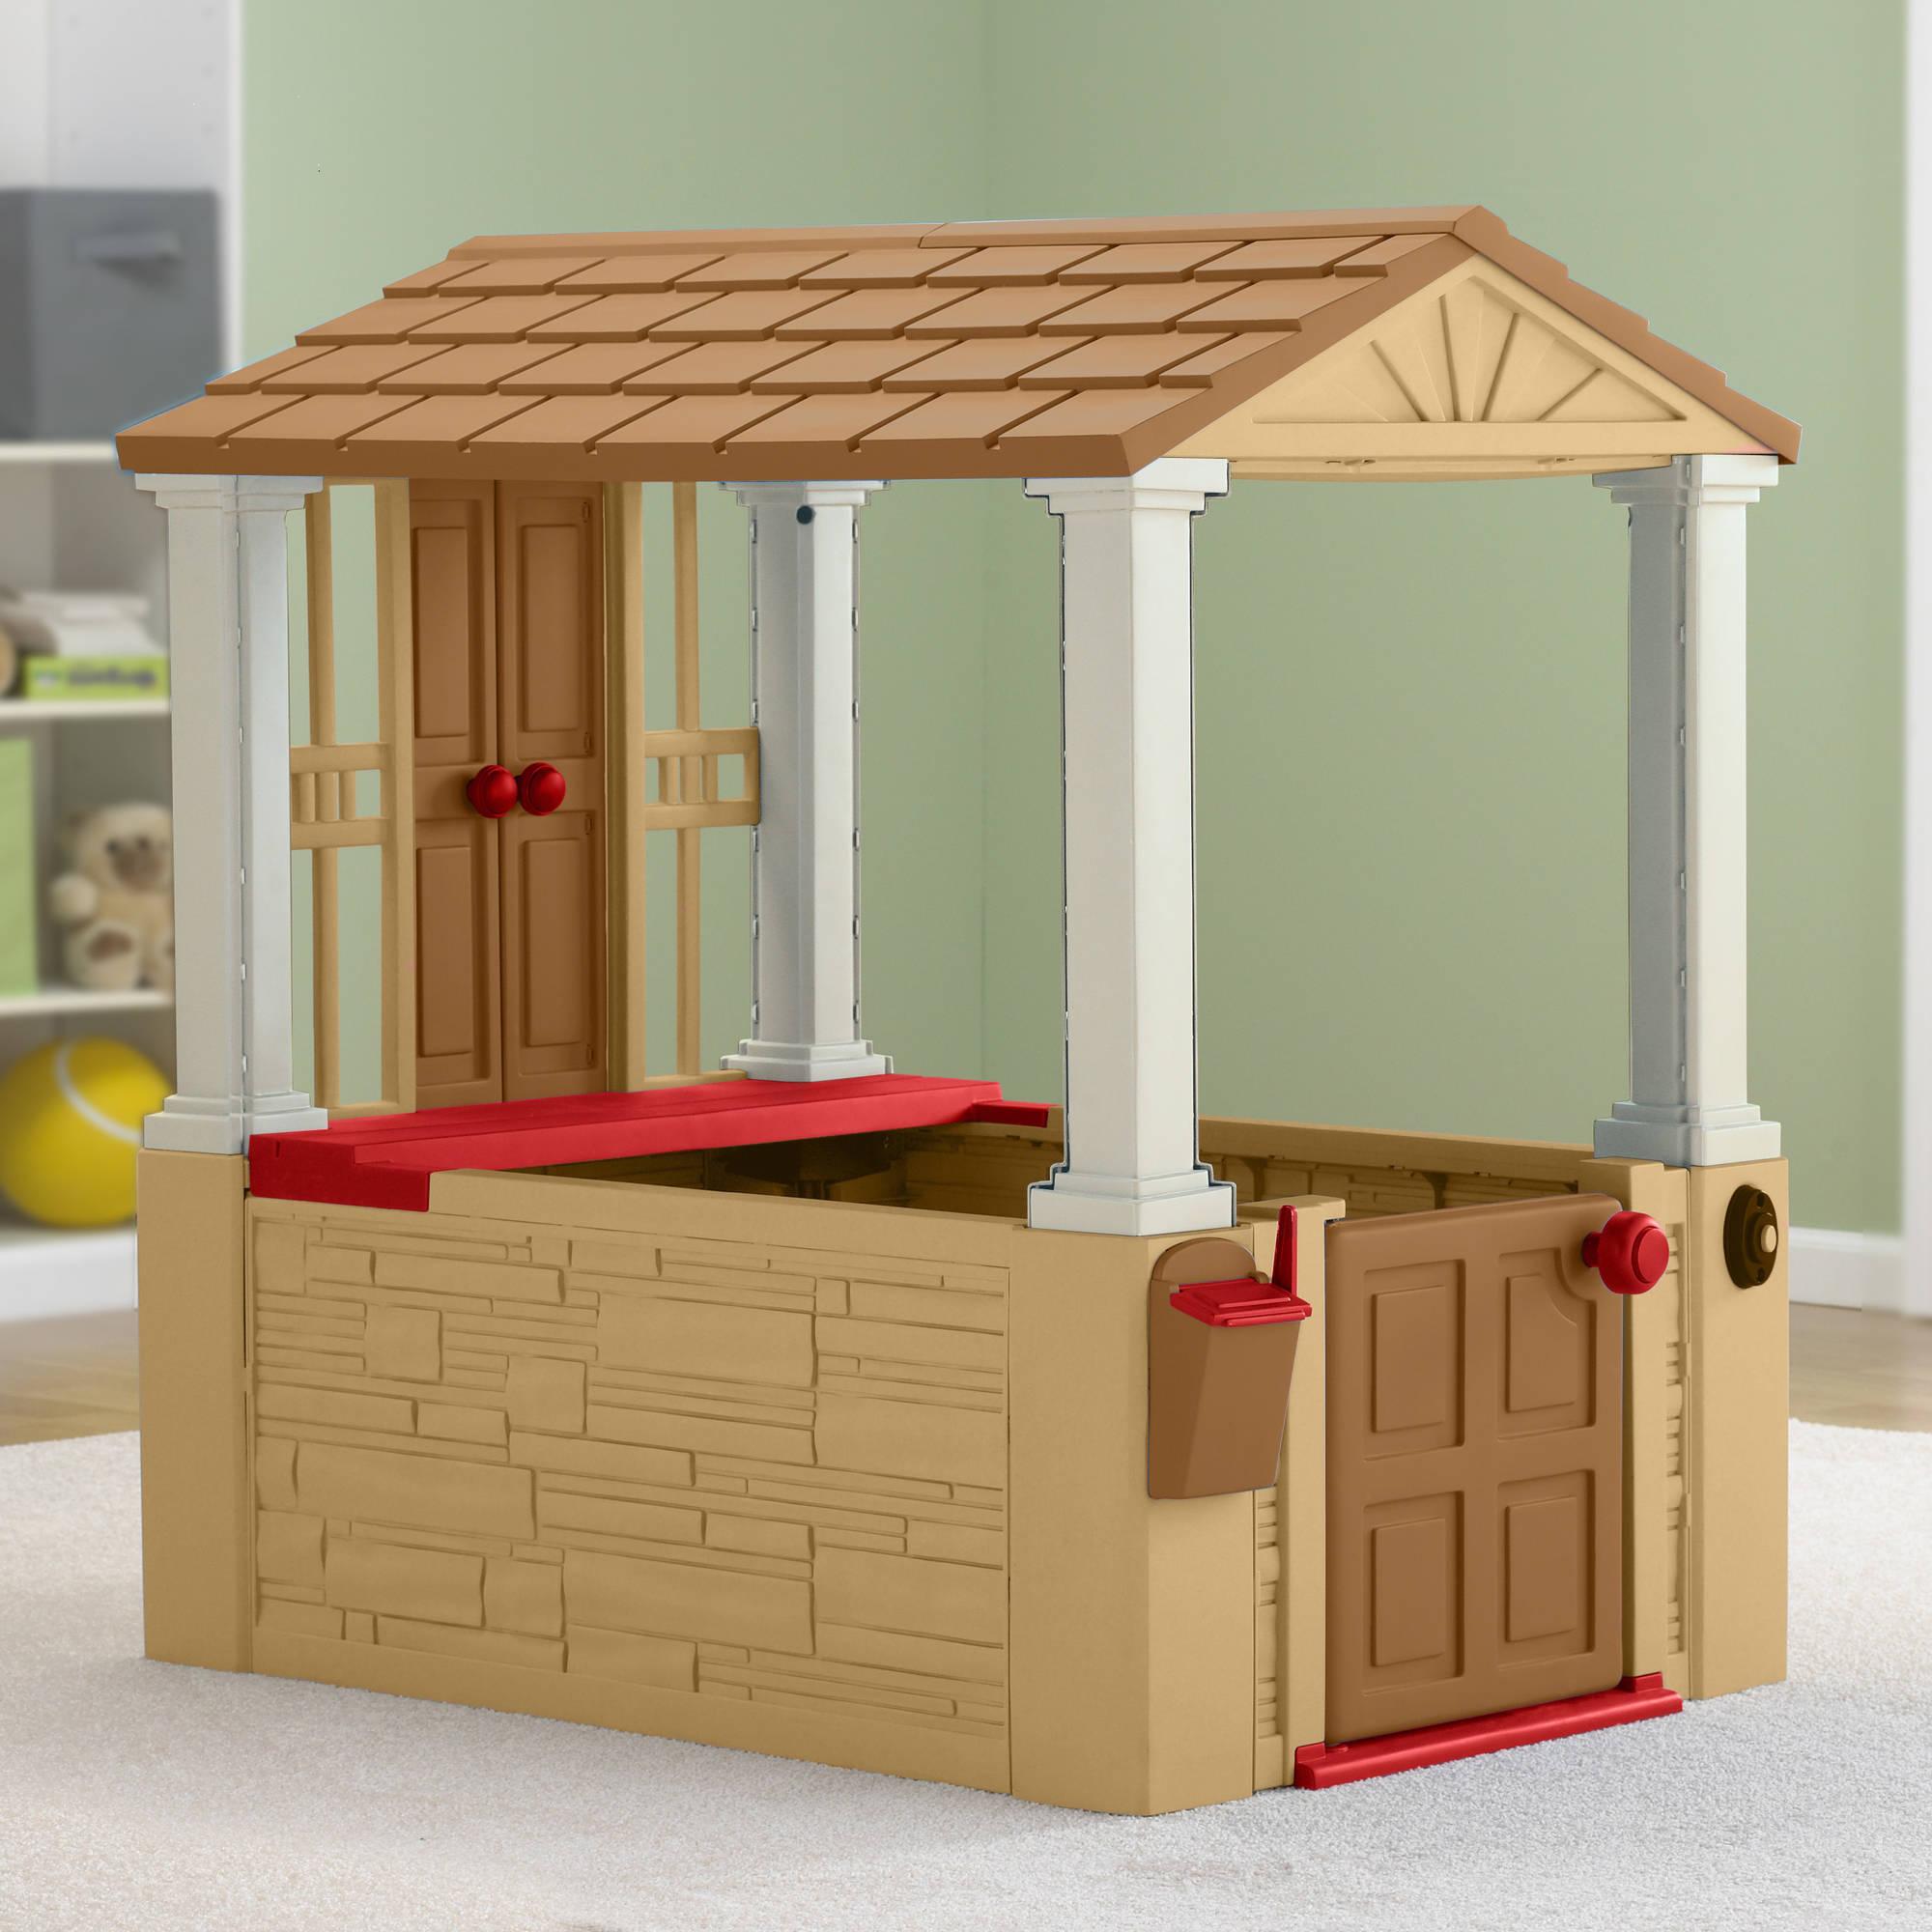 American Plastic Toys Playhouse